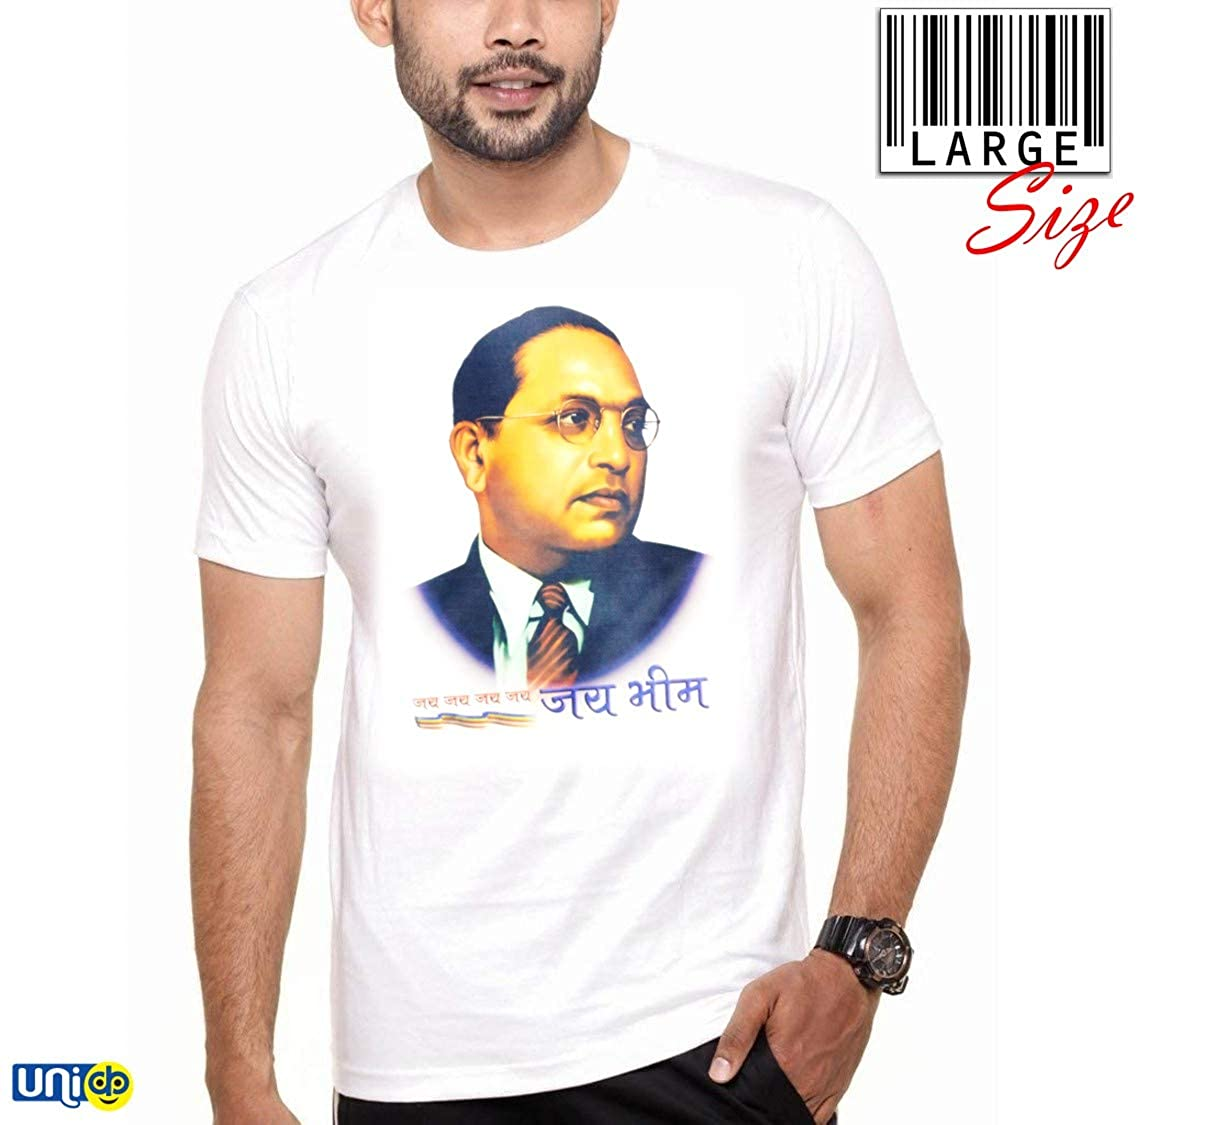 b824555bf UNIq Regular Fit Baba Saheb Ambedkar – Jai BHIM Printed Round Neck & Half  Sleeve White Poly Cotton T-Shirt for Boys/Men/Brother/Friends/Boy Friend on  ...